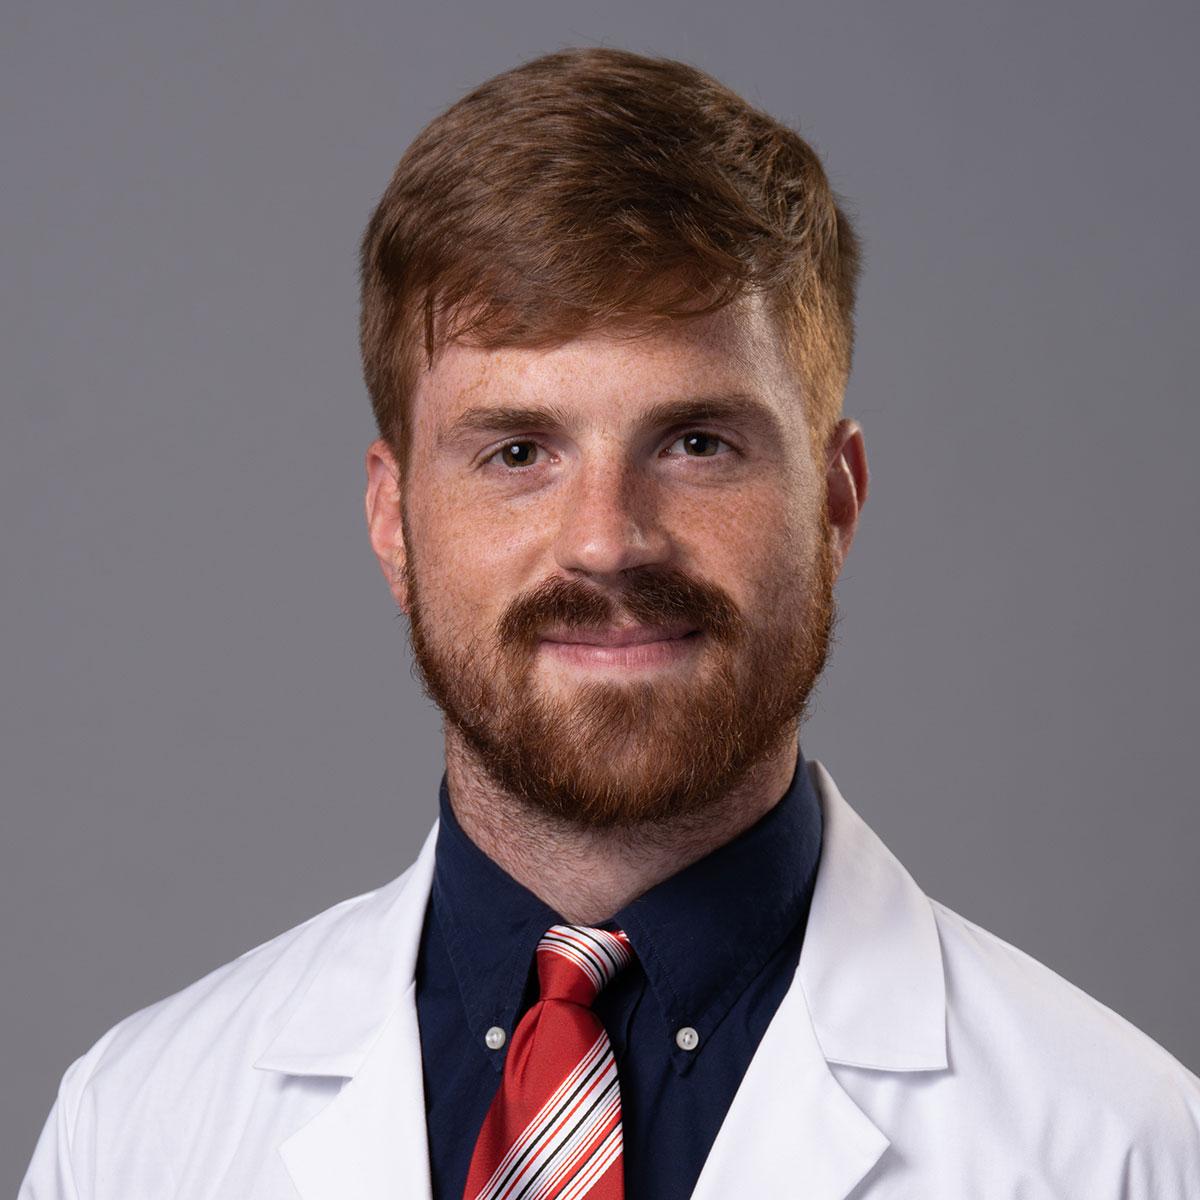 A friendly headshot of Dr. Ryan Parrish